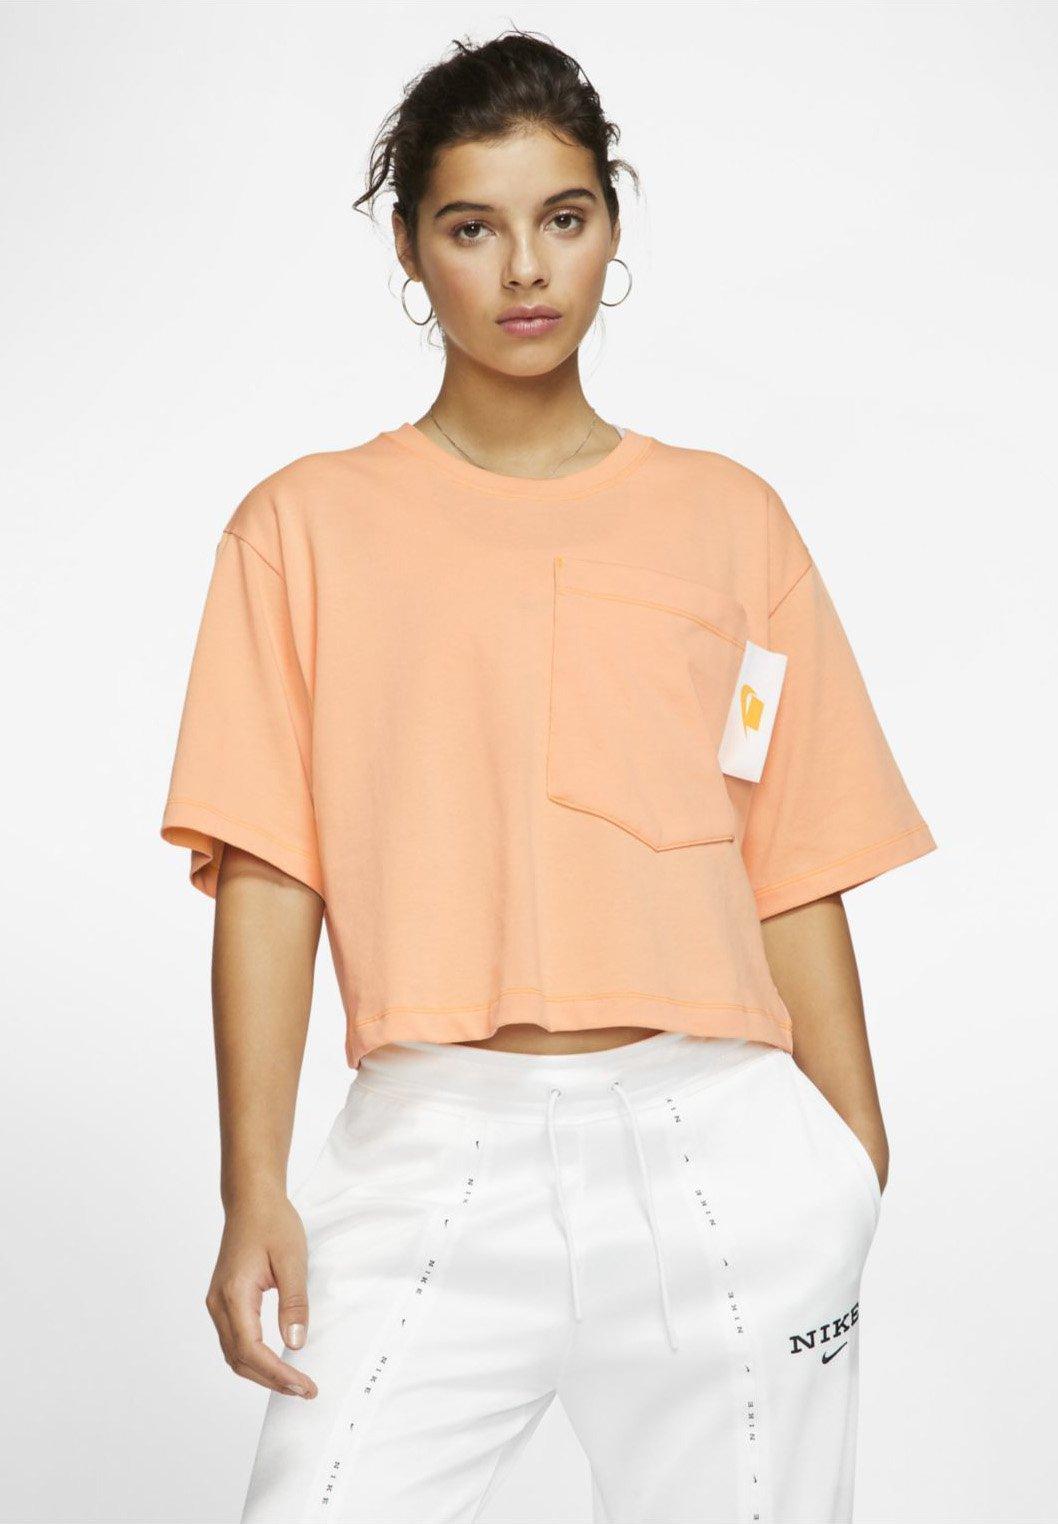 Damen NIKE SPORTSWEAR KURZARM-KURZOBERTEIL FÜR DAMEN - T-Shirt print